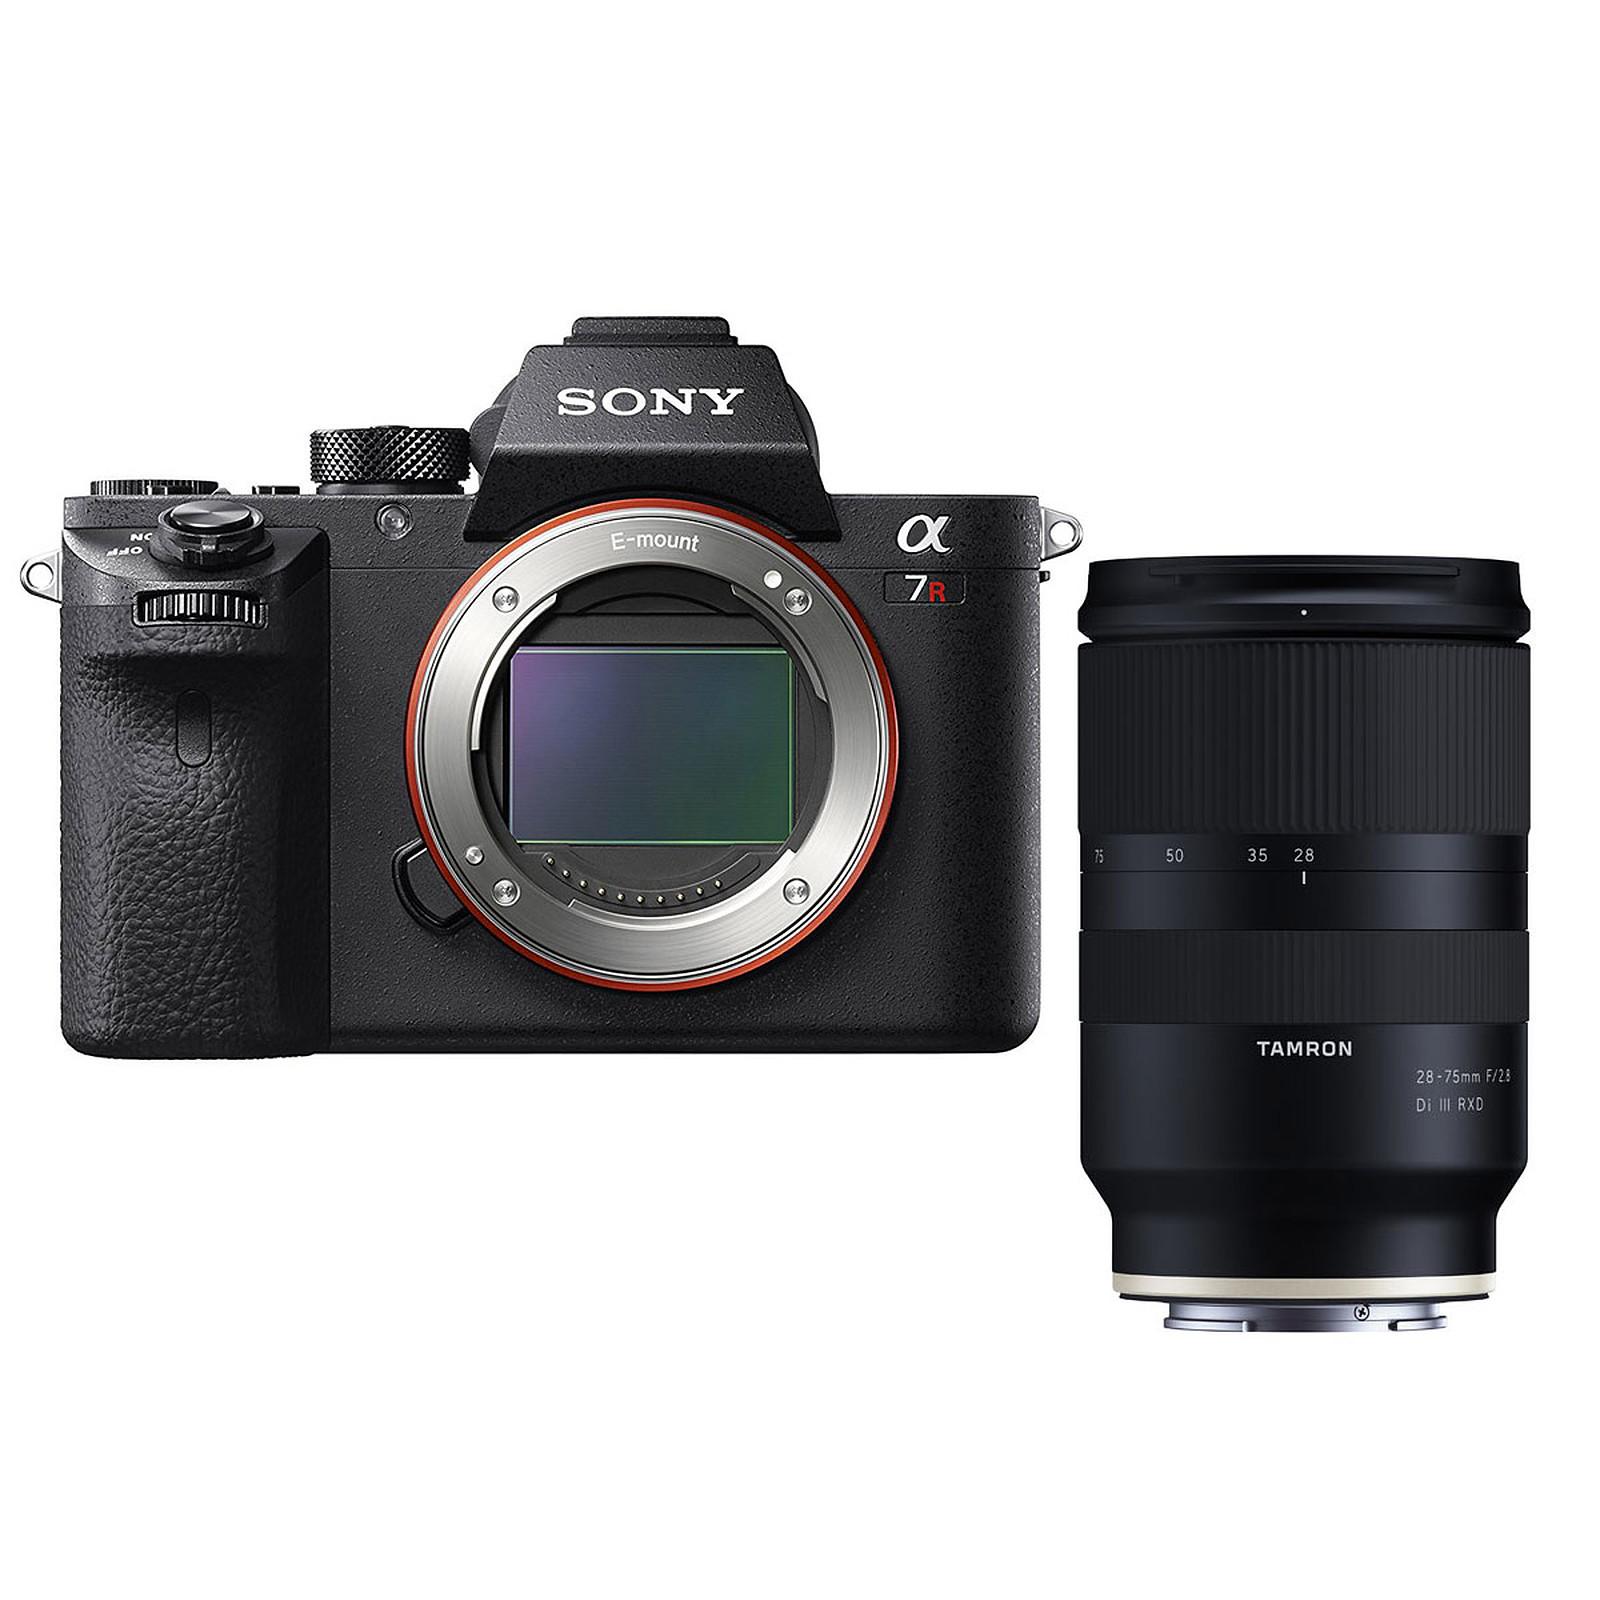 Sony Alpha 7R II + Tamron 28-75 mm f/2.8 Di III RXD Sony E